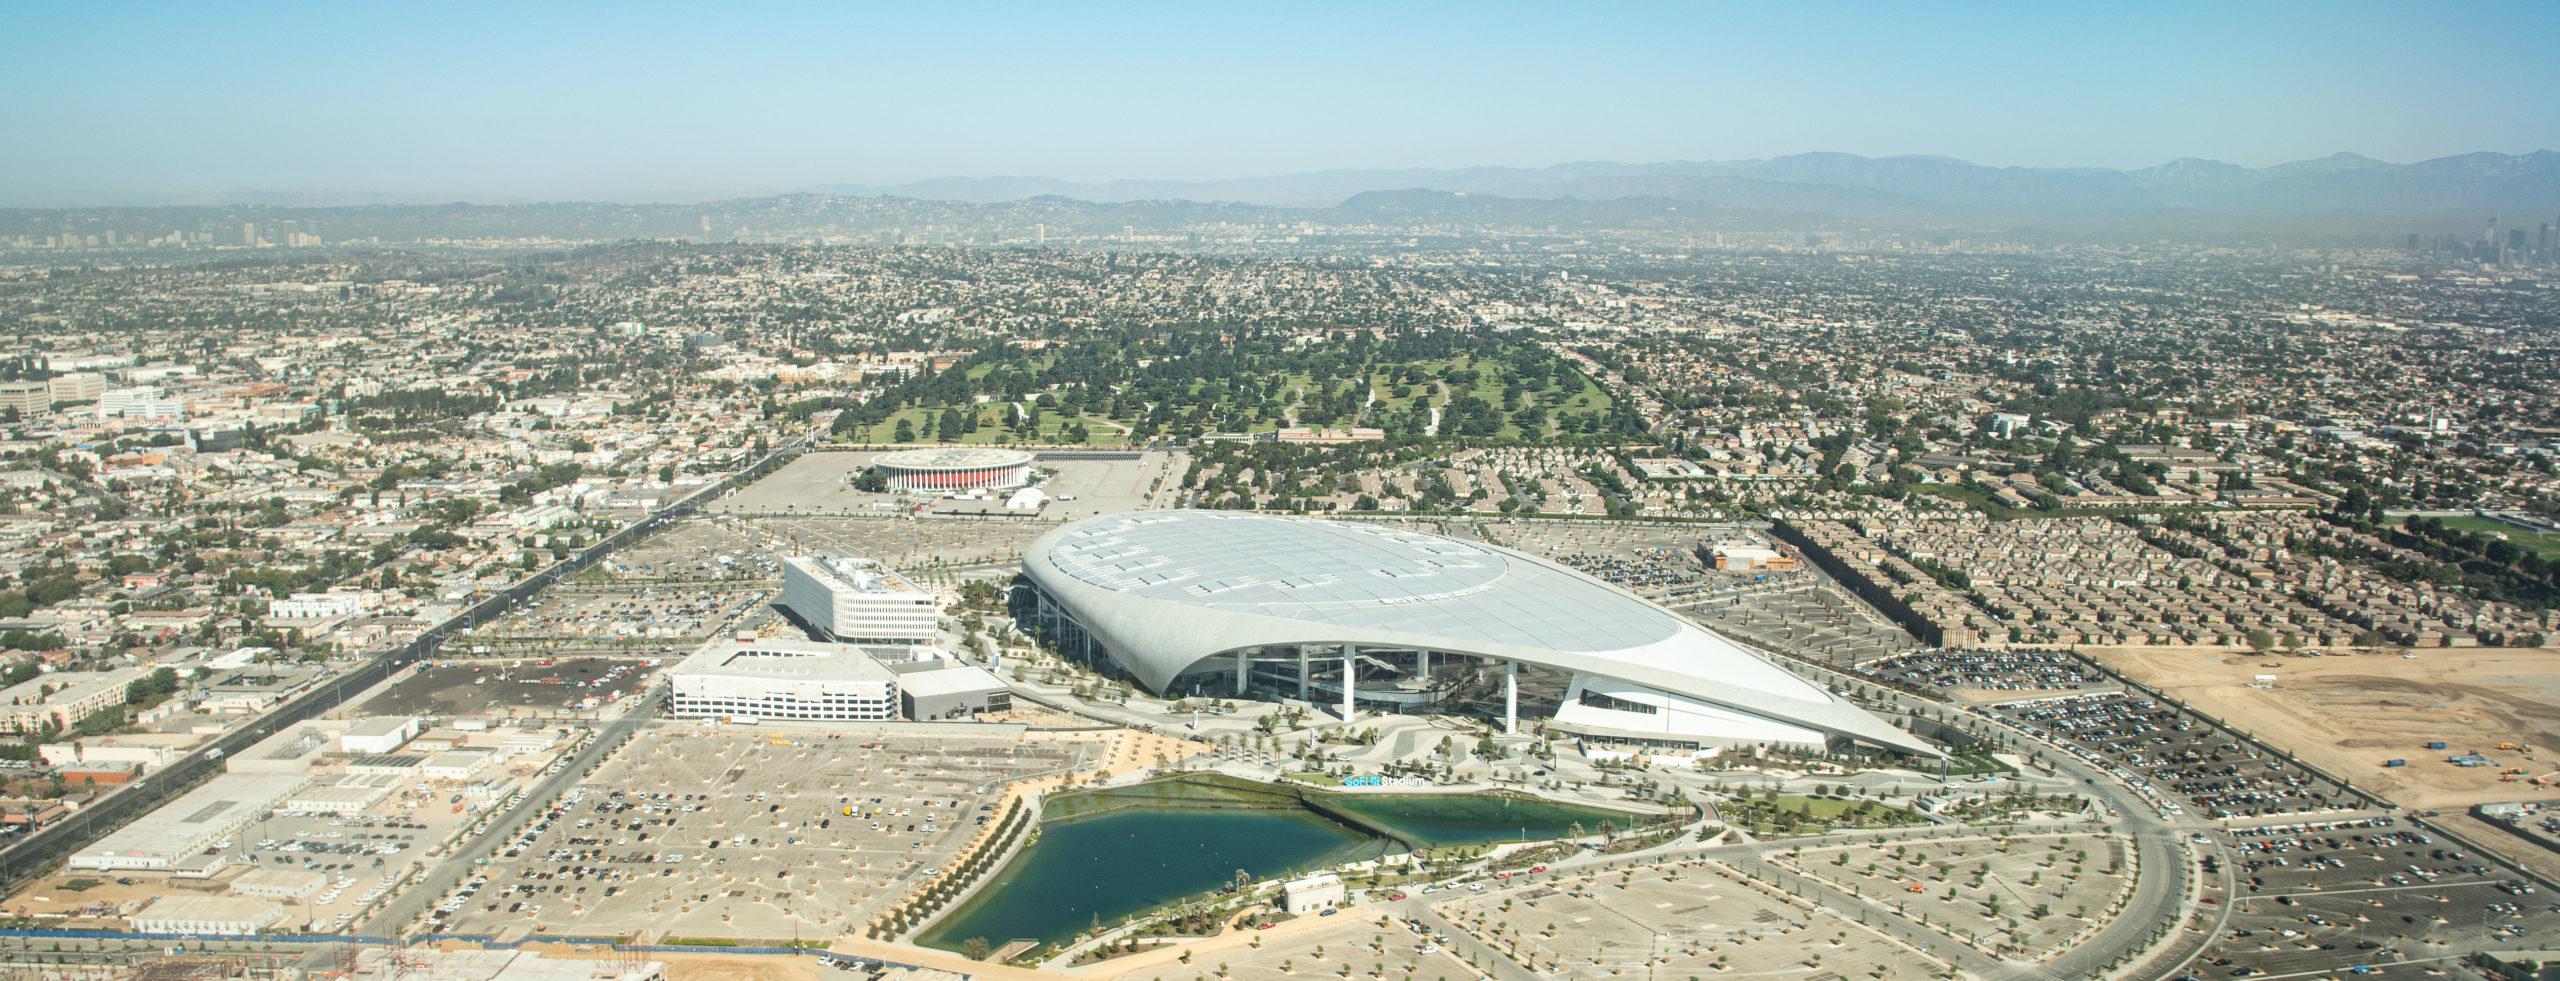 Los Angeles' SoFi Stadium: Breakthrough, Innovation, and Transformation